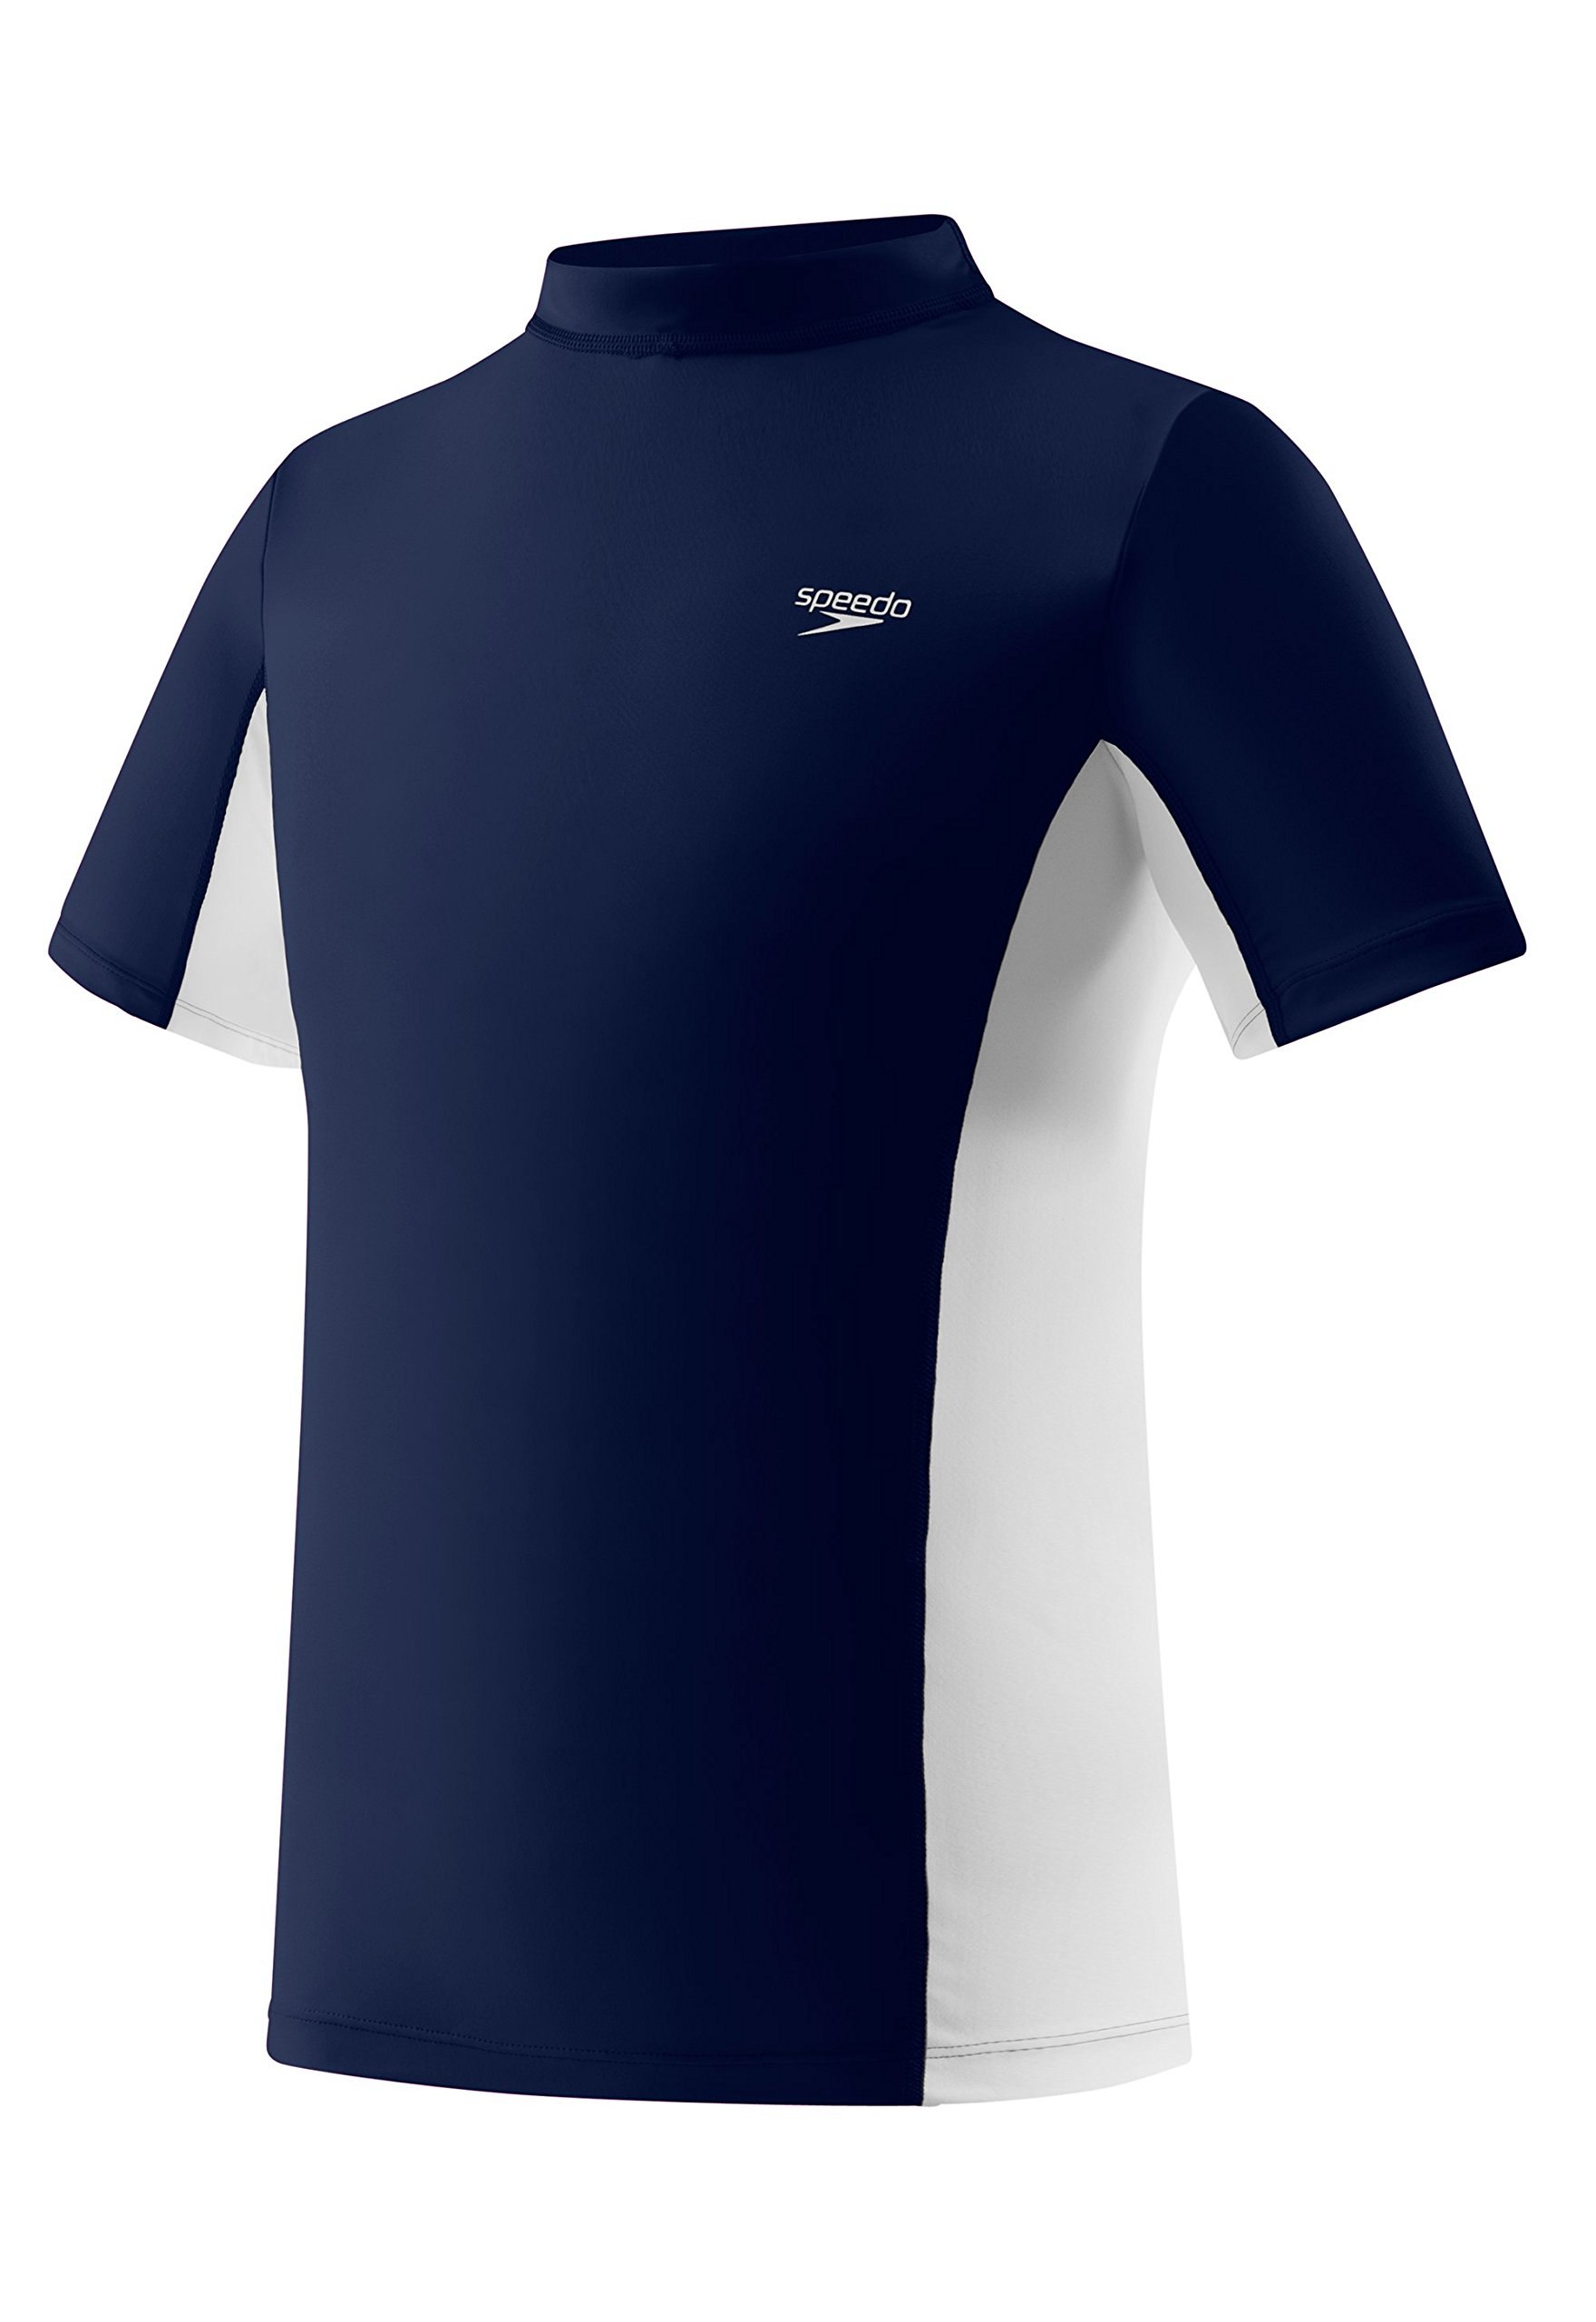 Speedo Big Boys' UV 50 Plus Short Sleeve Rashguard, Deep Water, Medium by Speedo